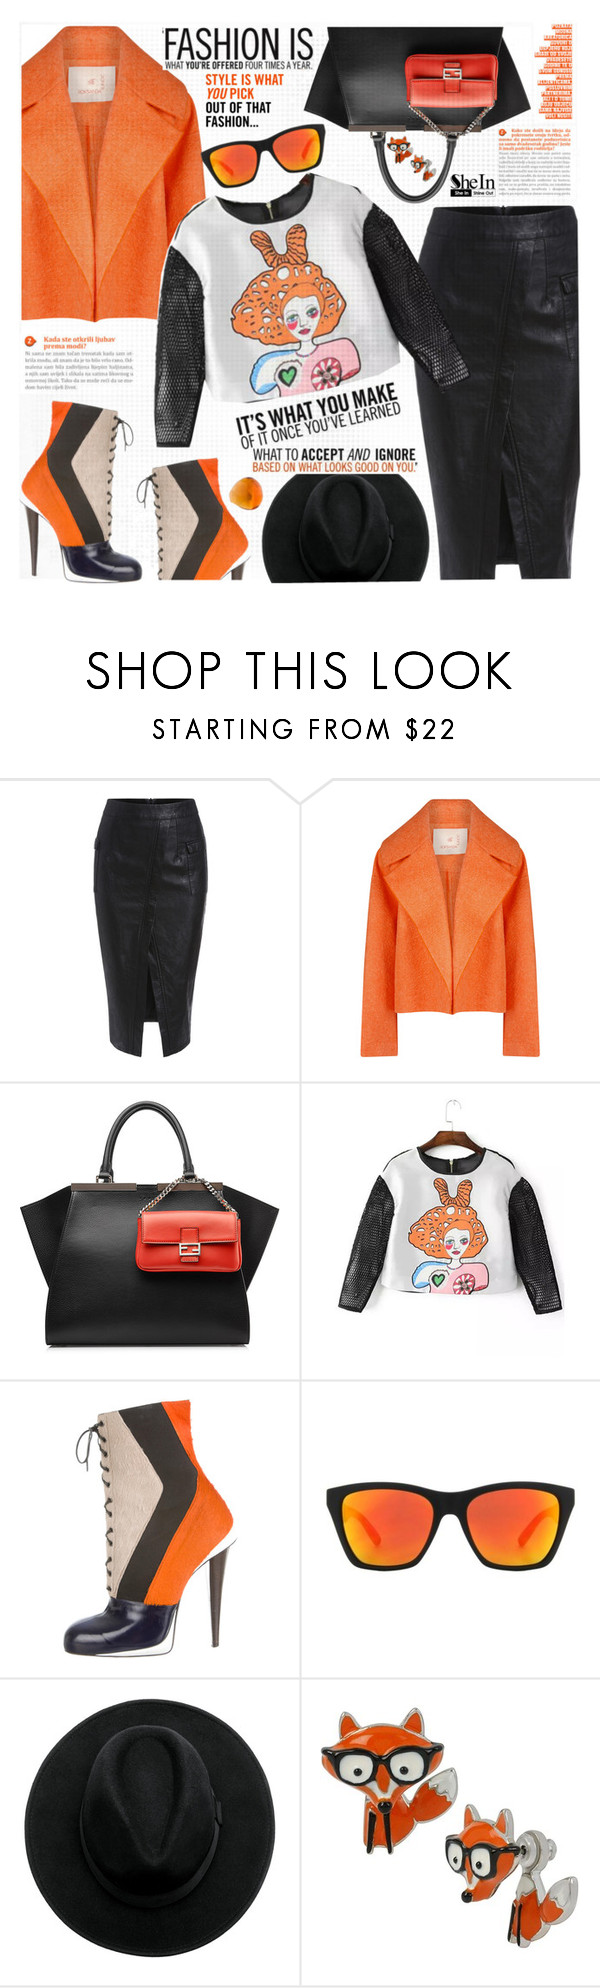 """Fashion is..."" by katjuncica ❤ liked on Polyvore featuring Roksanda, Fendi, VonZipper, Betsey Johnson, Lalique, women's clothing, women's fashion, women, female and woman"